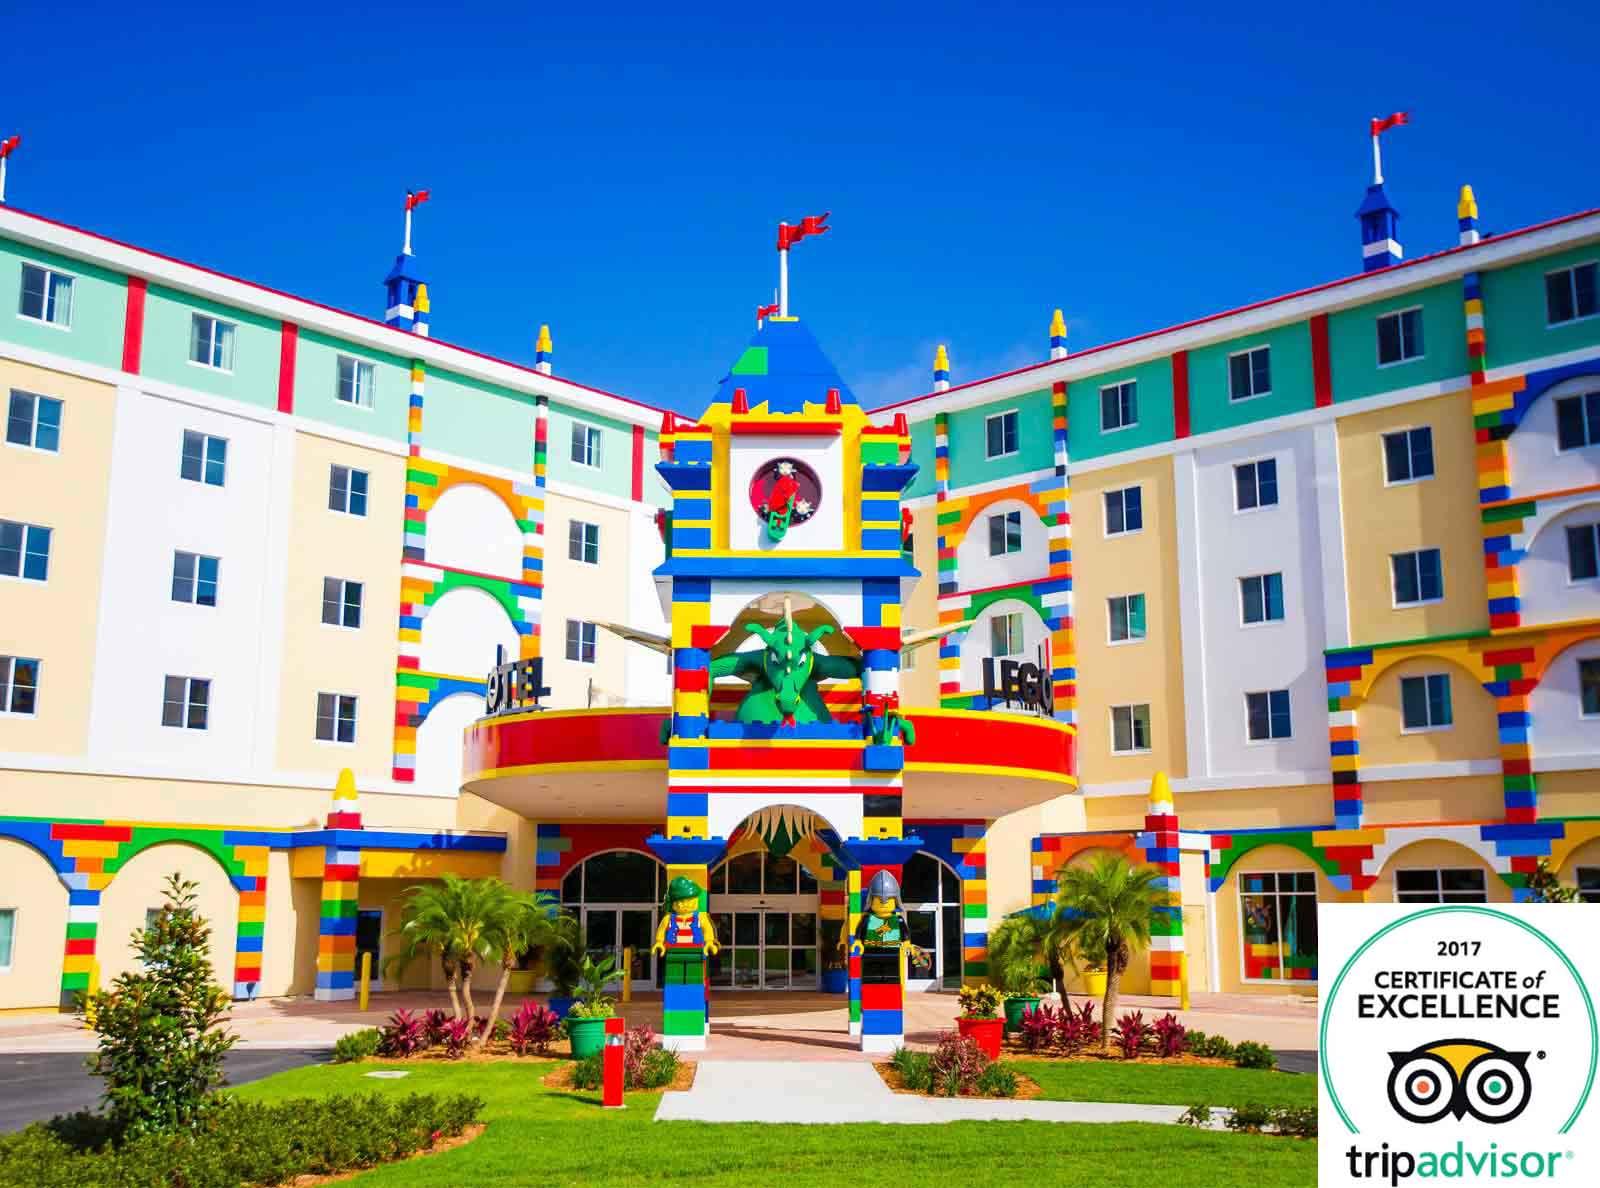 About the LEGOLAND® Parks - Awesome awaits at LEGOLAND®